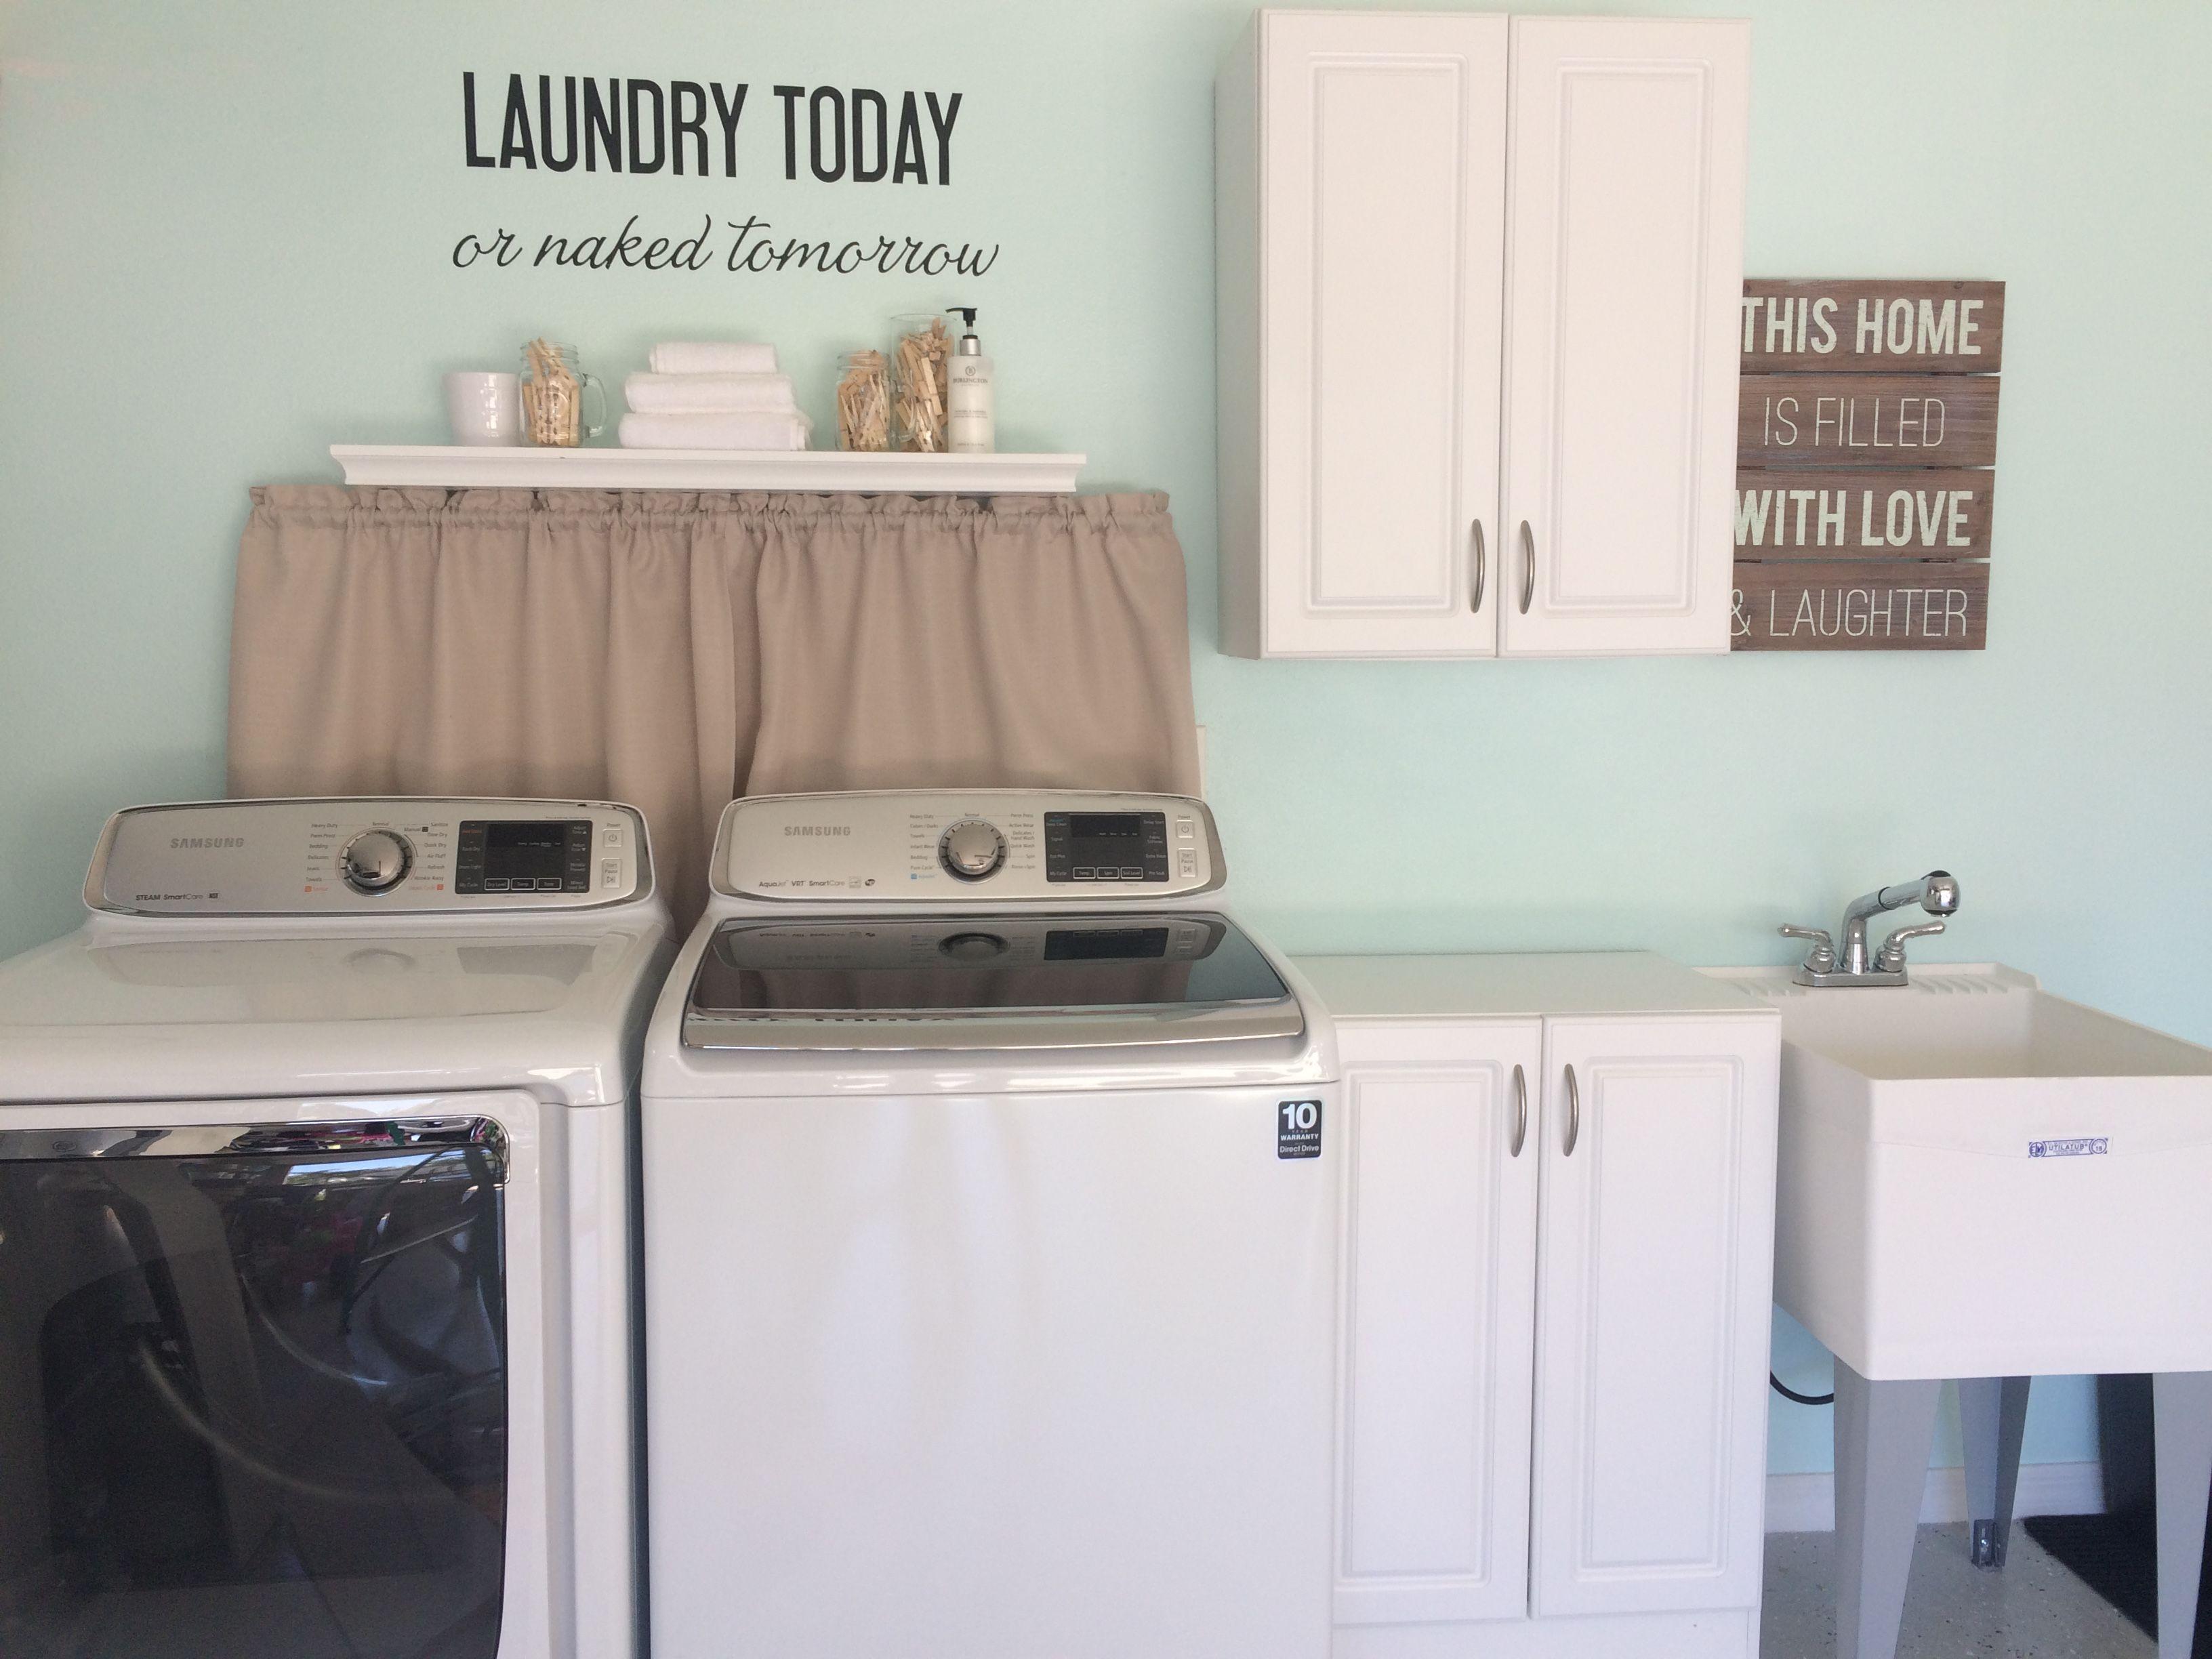 Laundry Room Paint Color Valspar Stillness Laundry Room Paint Color Laundry Room Paint Colors Valspar Laundry Room Paint Paint my laundry room